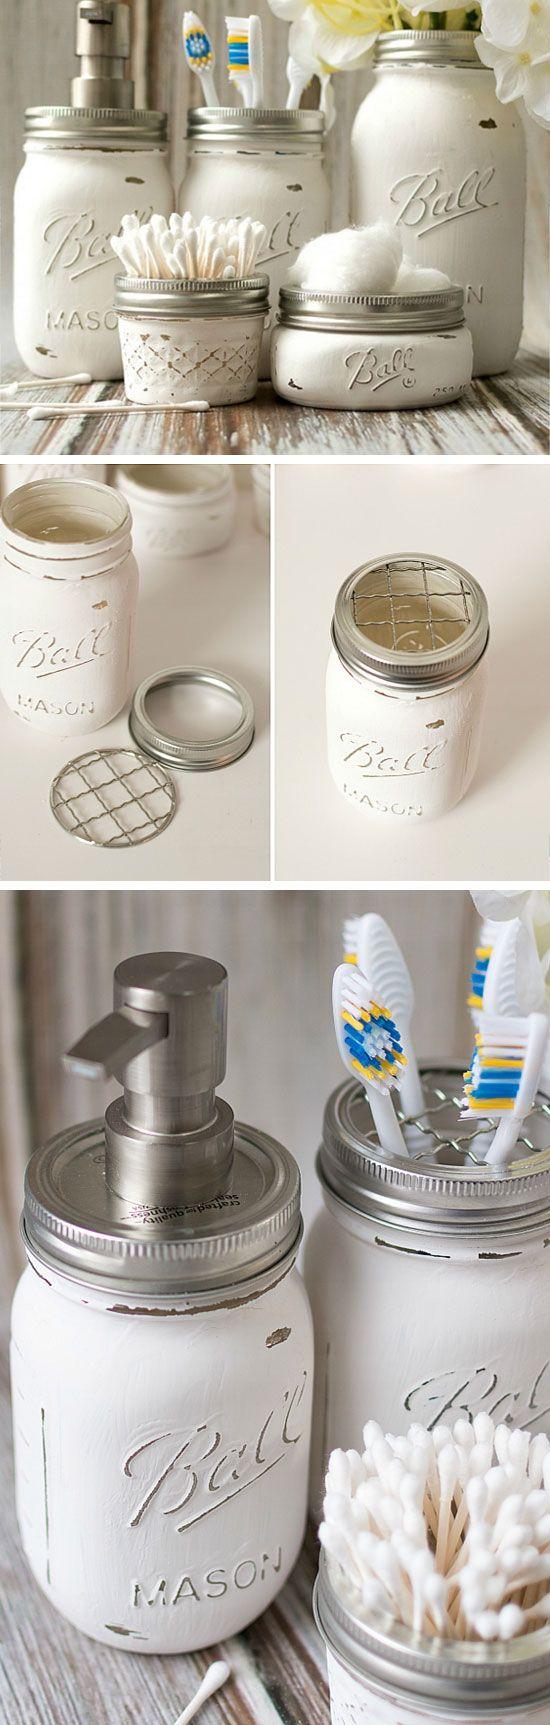 20 DIY Bathroom Storage Ideas for Small Spaces  Jars